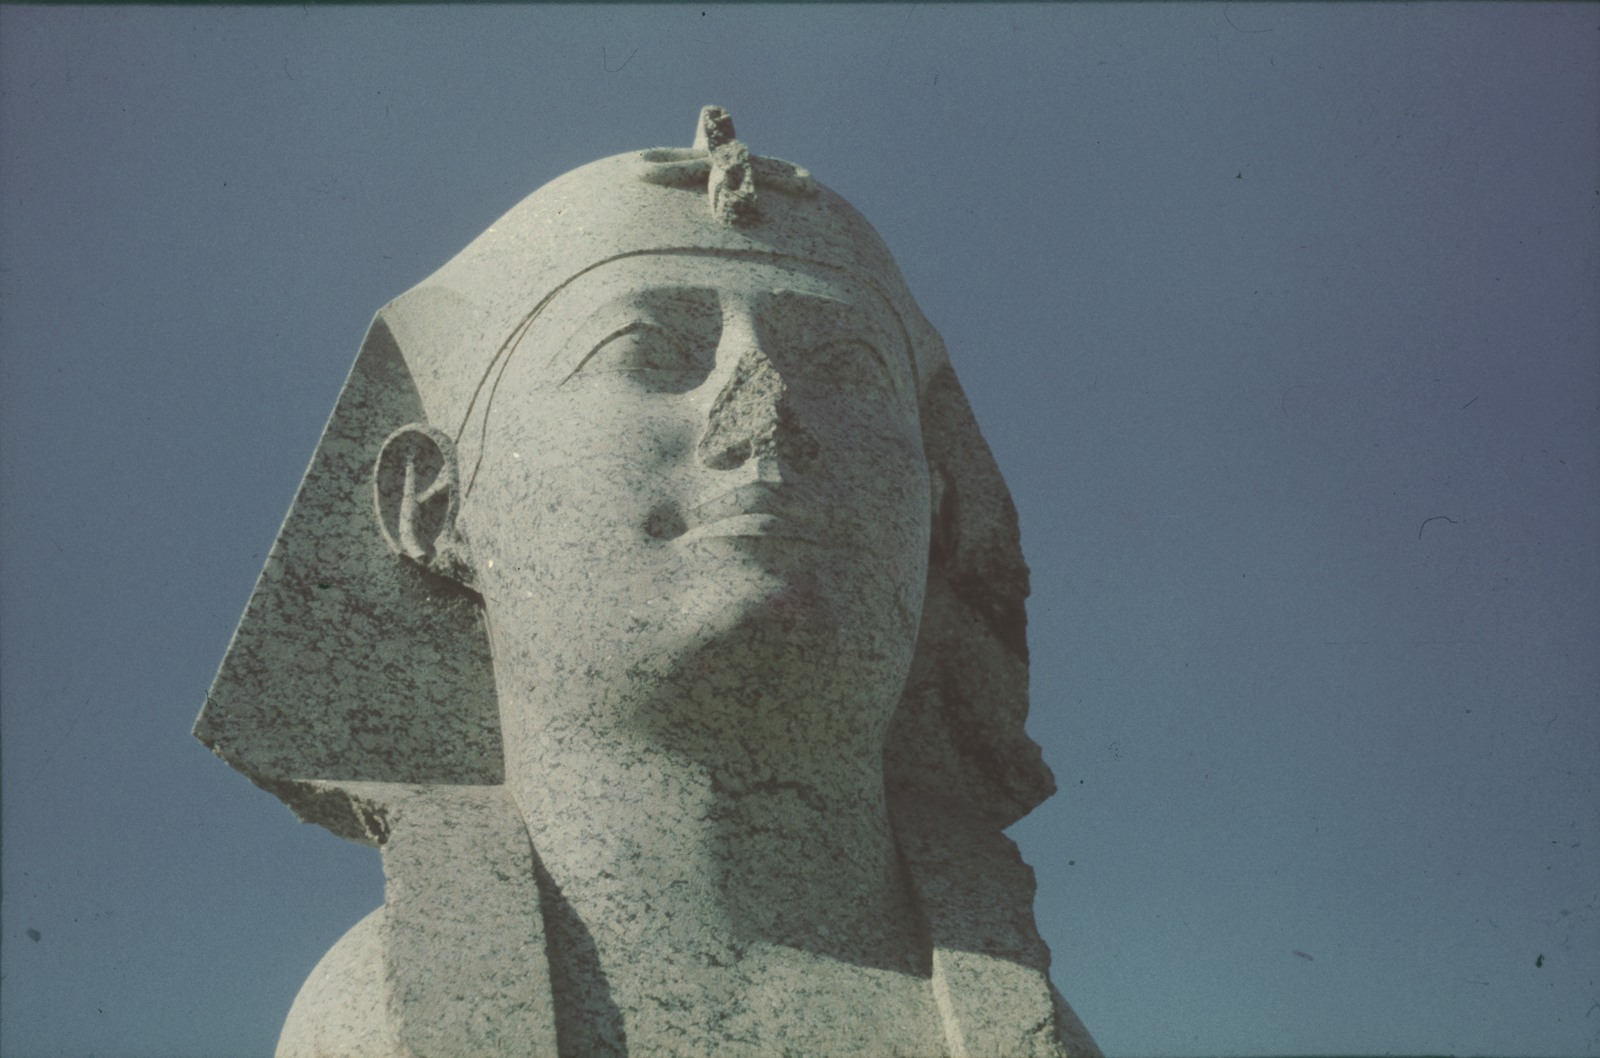 Александрия. Голова сфинкса возле Александрийского столпа (Колонна Помпея)